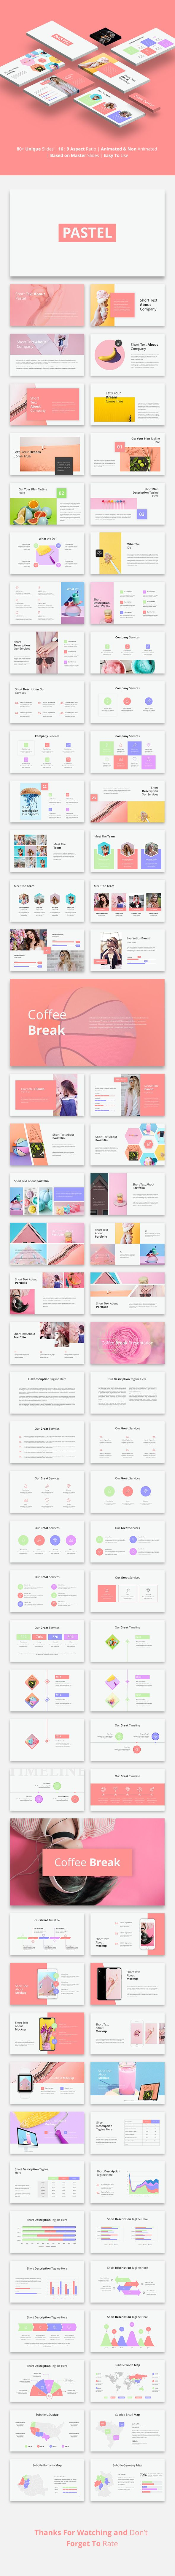 Dare - Pastel Minimal Powerpoint Template | PowerPoint Templates ...